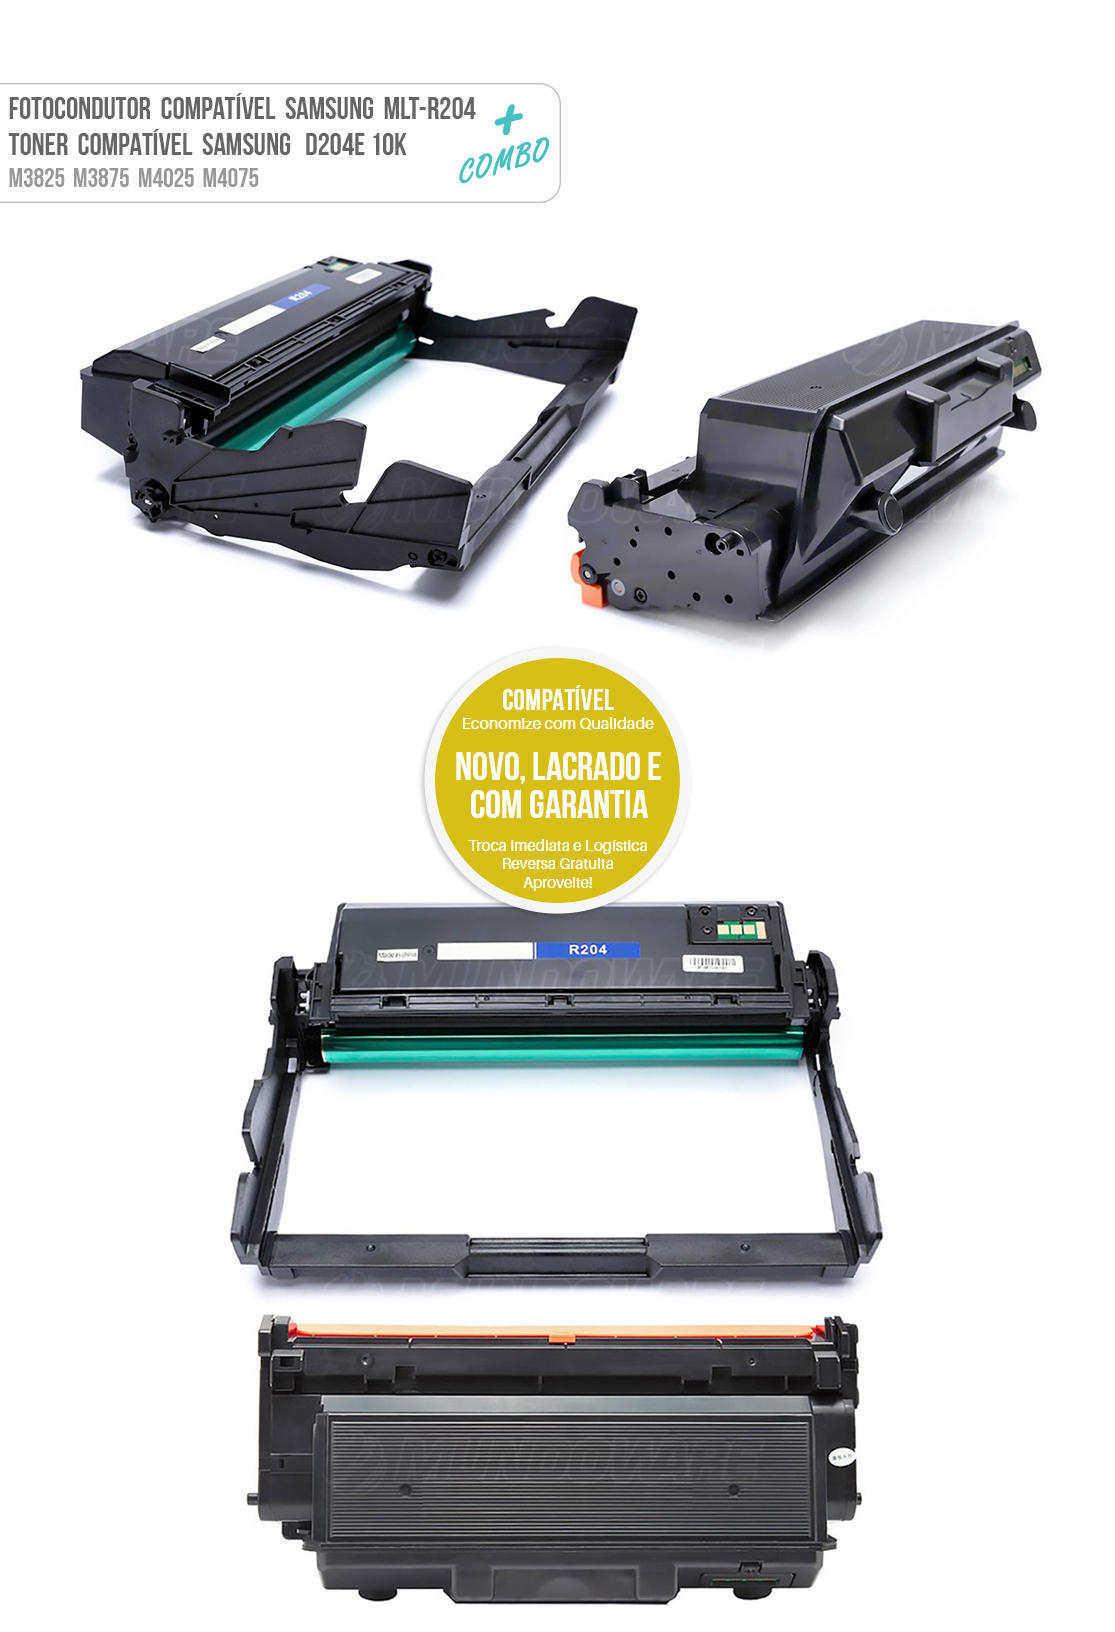 Cartucho de Cilindro Samsung DR204 R204 + Toner D204E para M 3825DW M 3825ND M 4025ND M 3875FW M 3875FD M 4075FW tonner